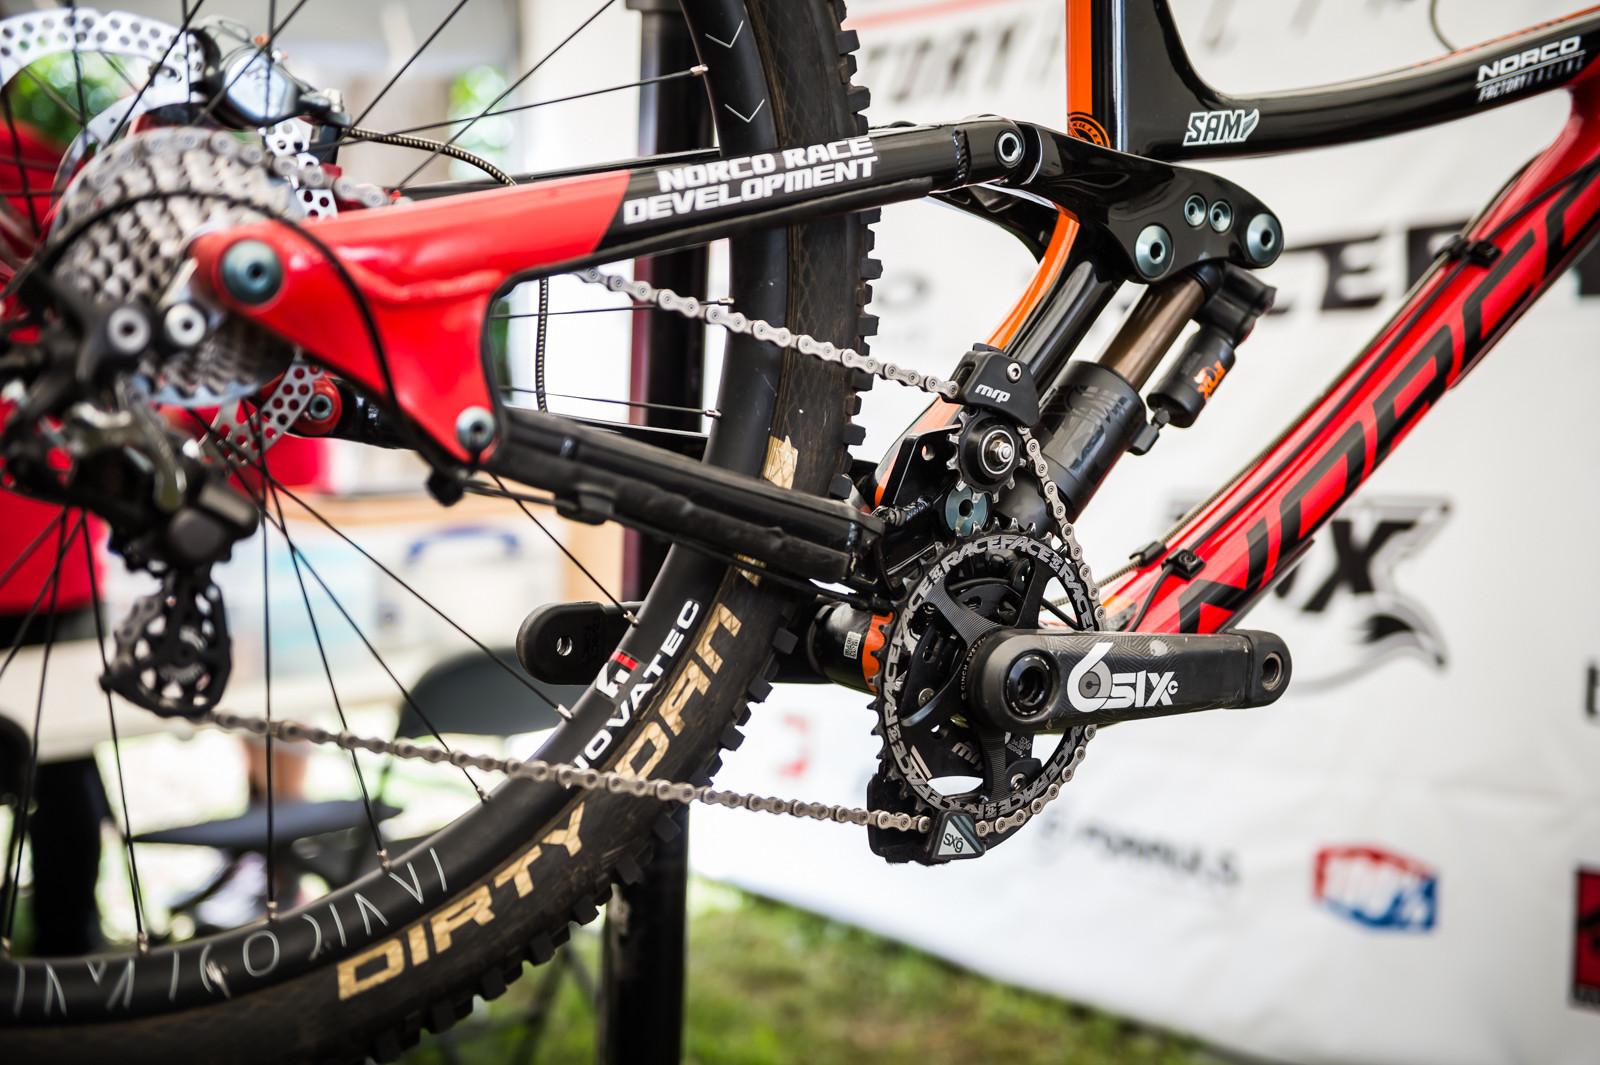 Sam Blenkinsop's Norco Aurum - PIT BITS - 2016 Lourdes World Cup Downhill - Mountain Biking Pictures - Vital MTB